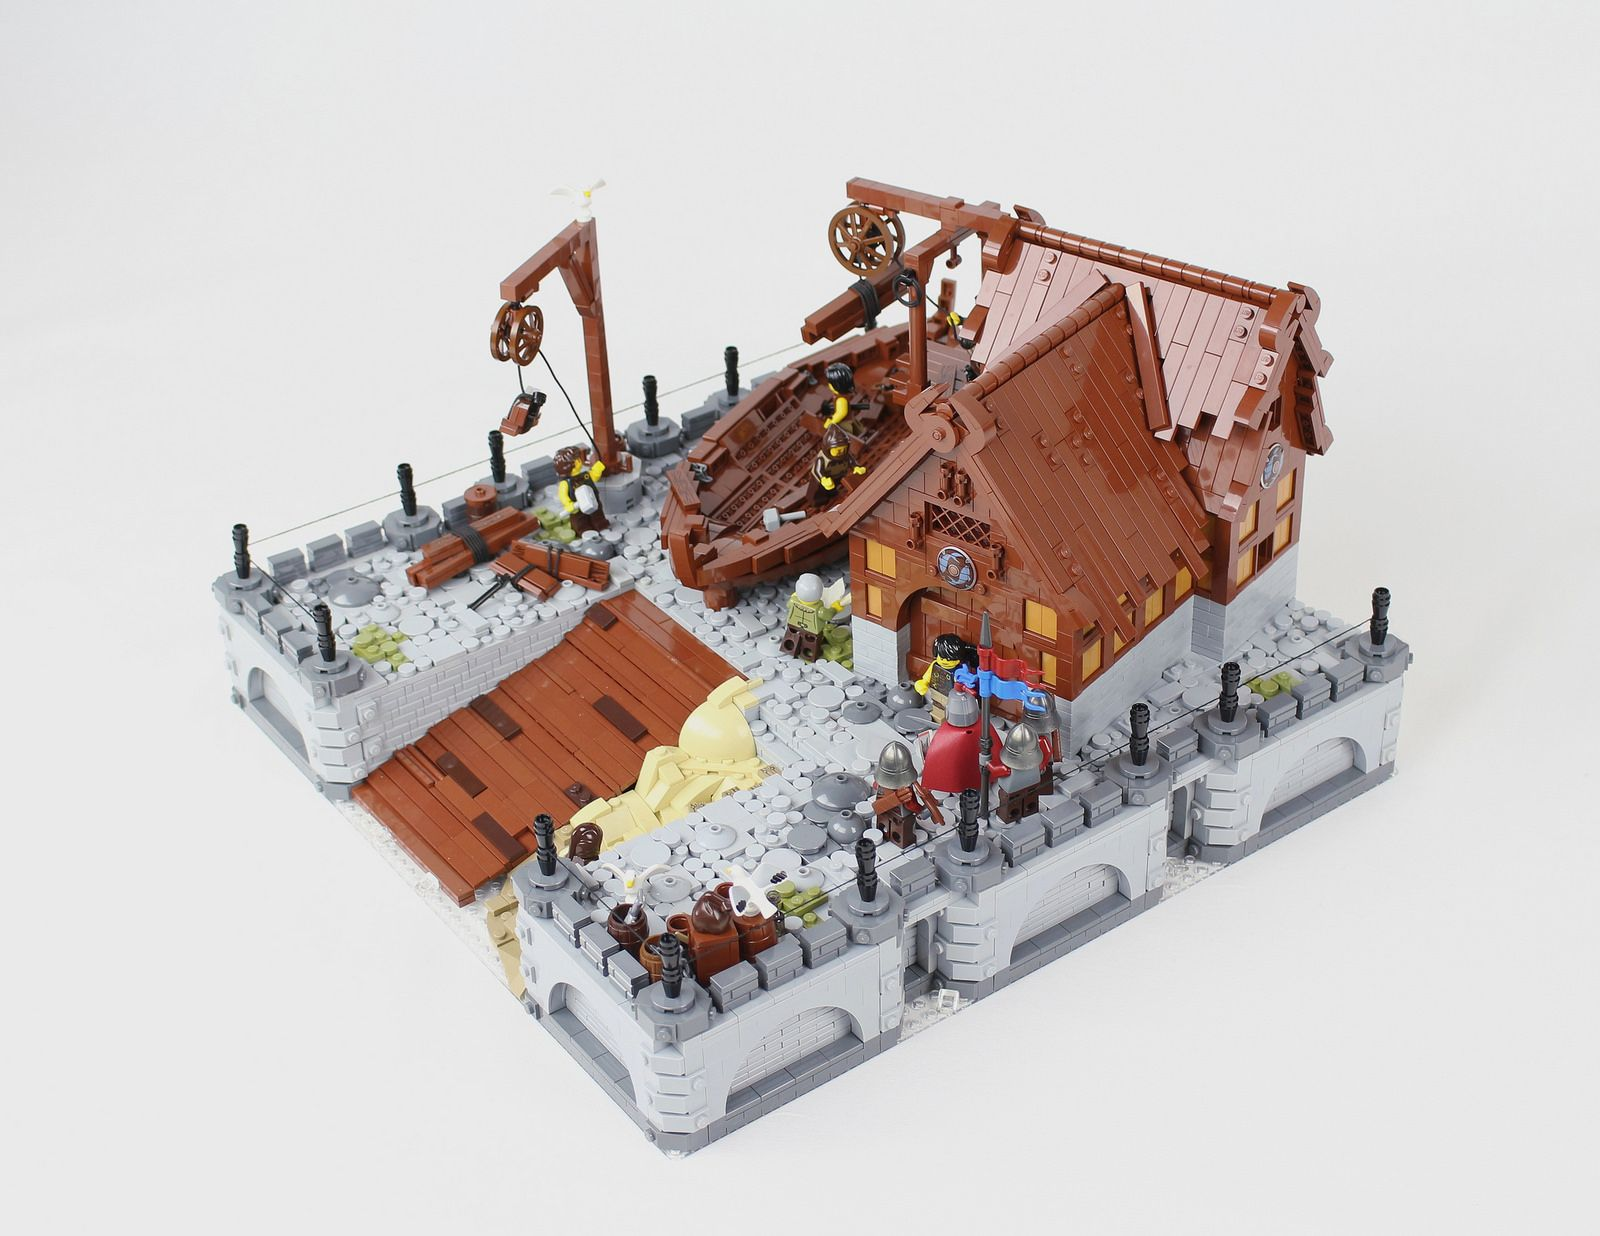 Nurmes Shipyard Geek Lego Castle Lego Ship Lego Creations